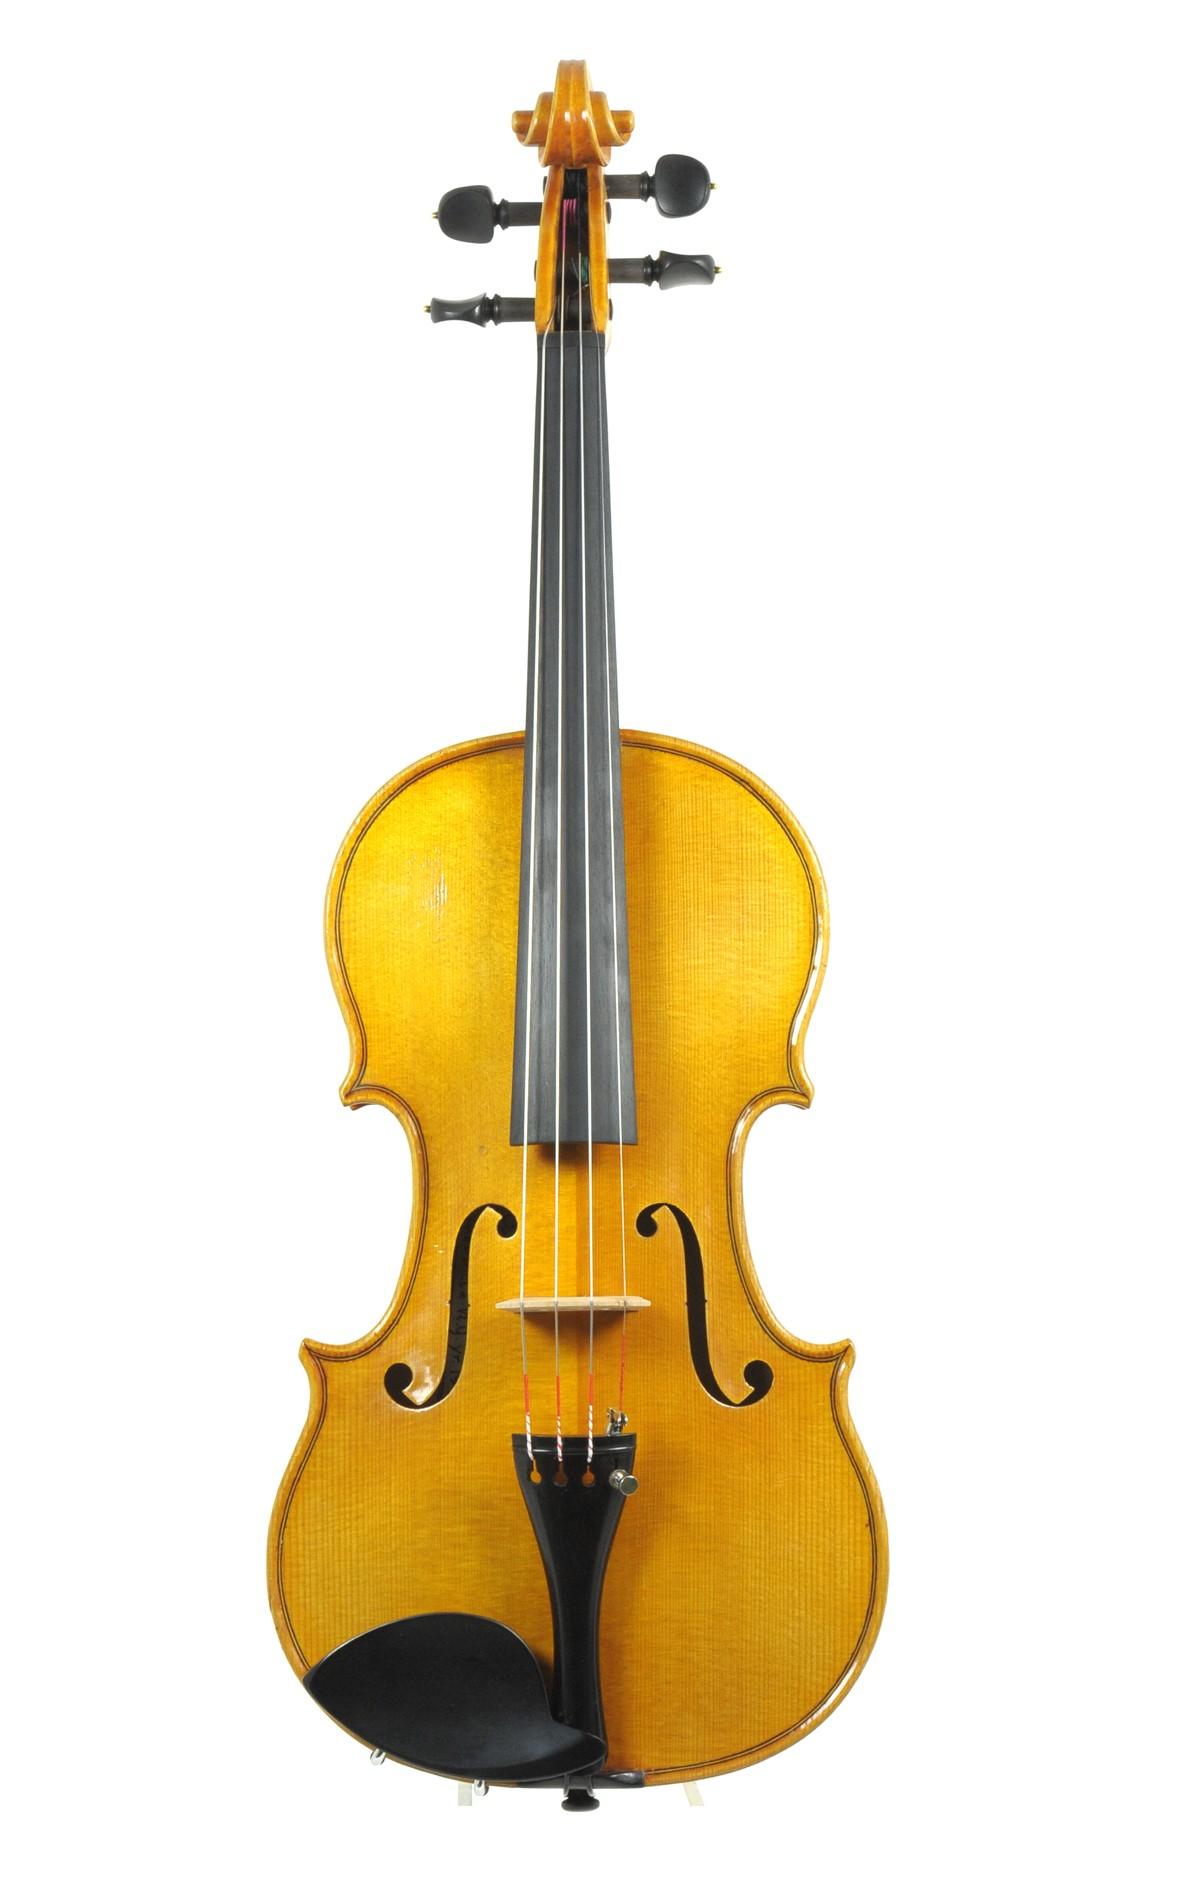 New York violin maker Peter Eibert